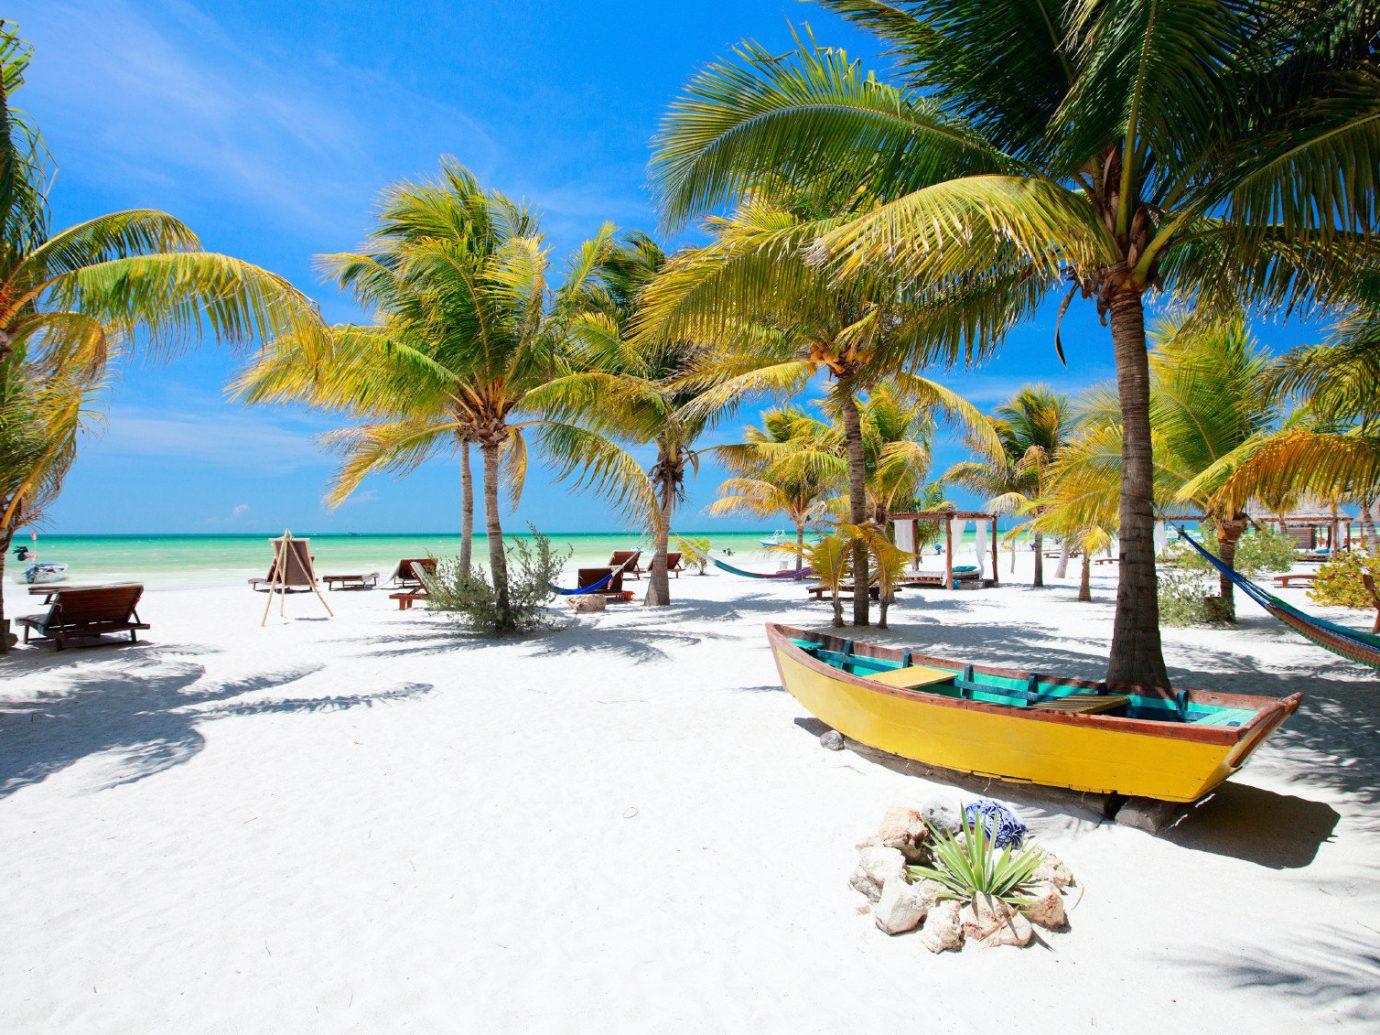 Secret Getaways Trip Ideas tree outdoor sky water Beach palm leisure Resort vacation caribbean arecales Sea Ocean Pool Lagoon tropics bay Island plant shore lined sandy